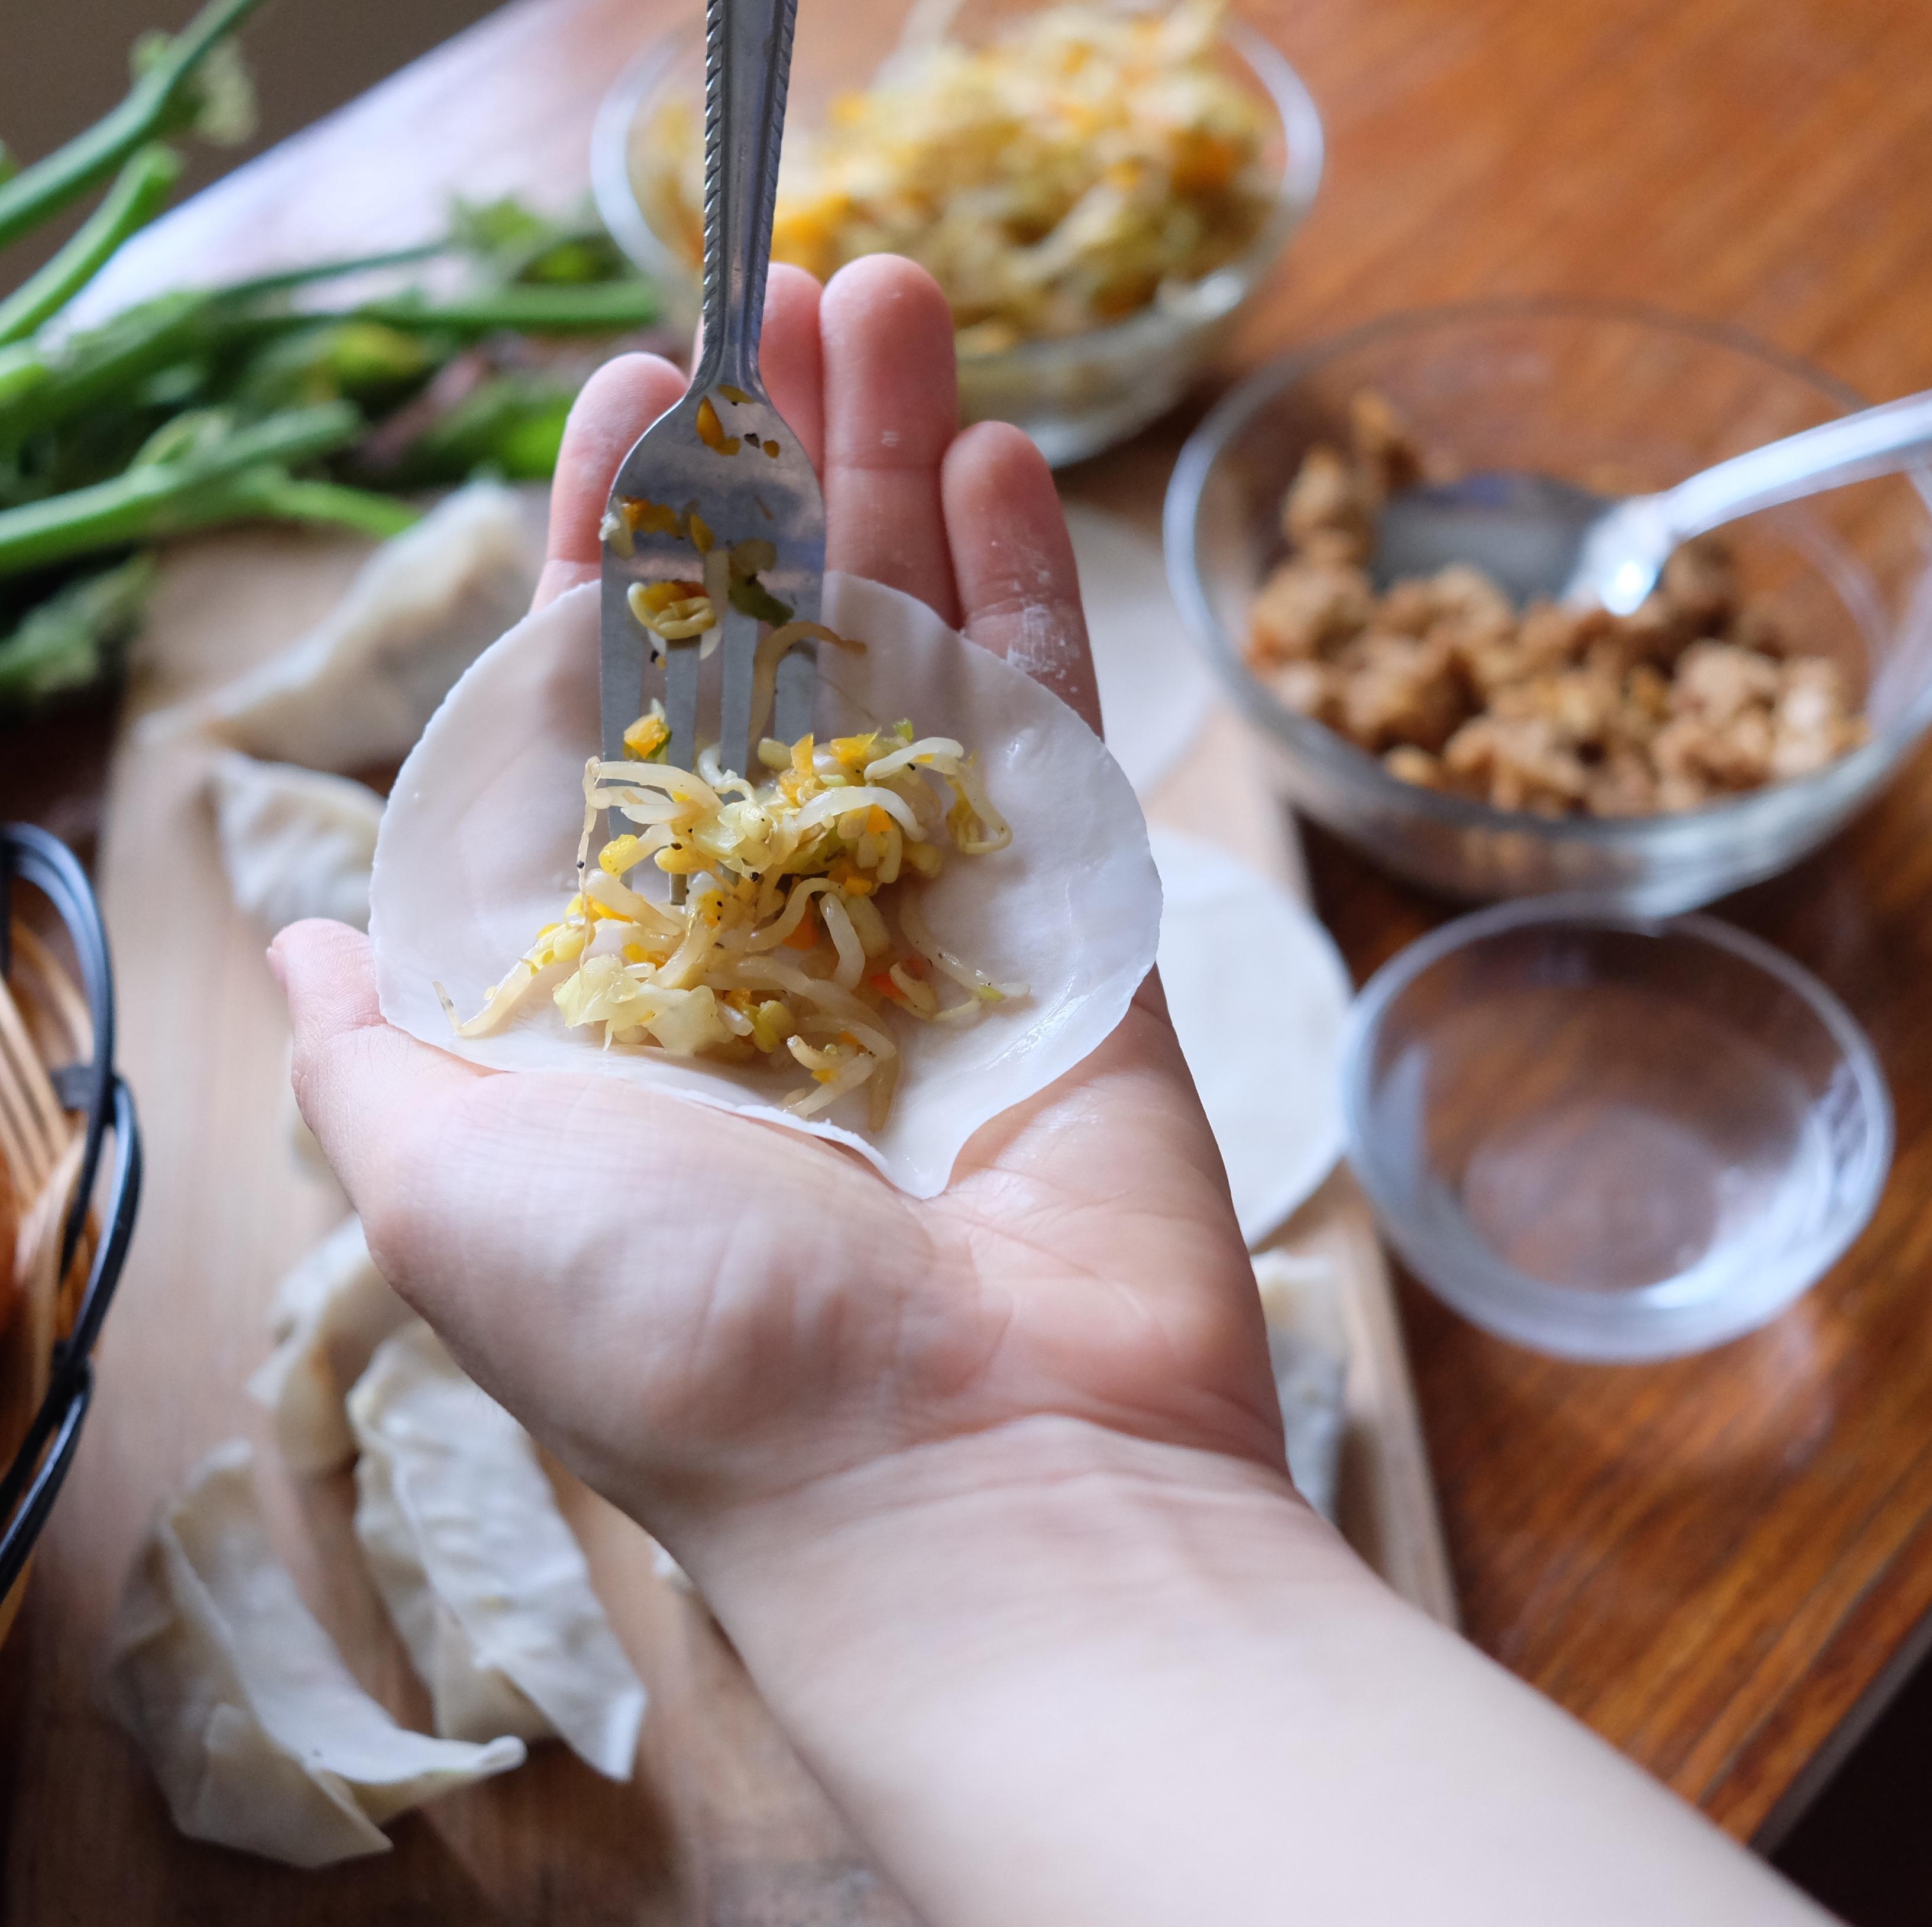 Super Tempeh Vegetable Dumplings Recipe - The Superfood Grocer Philippines